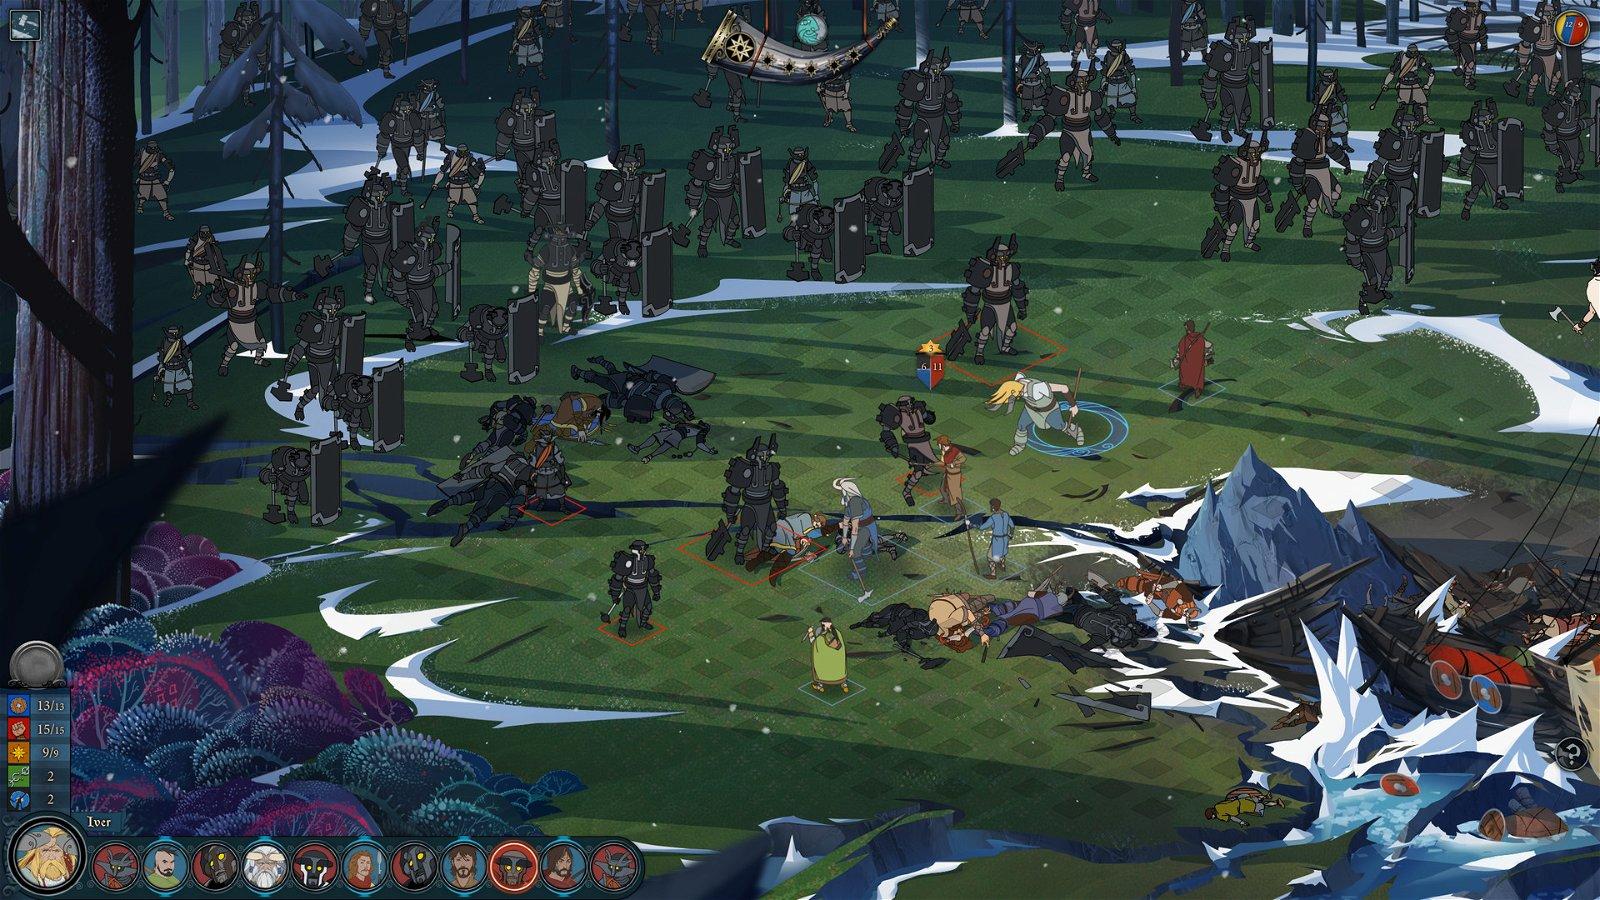 Banner Saga 2 (Pc) Review 4